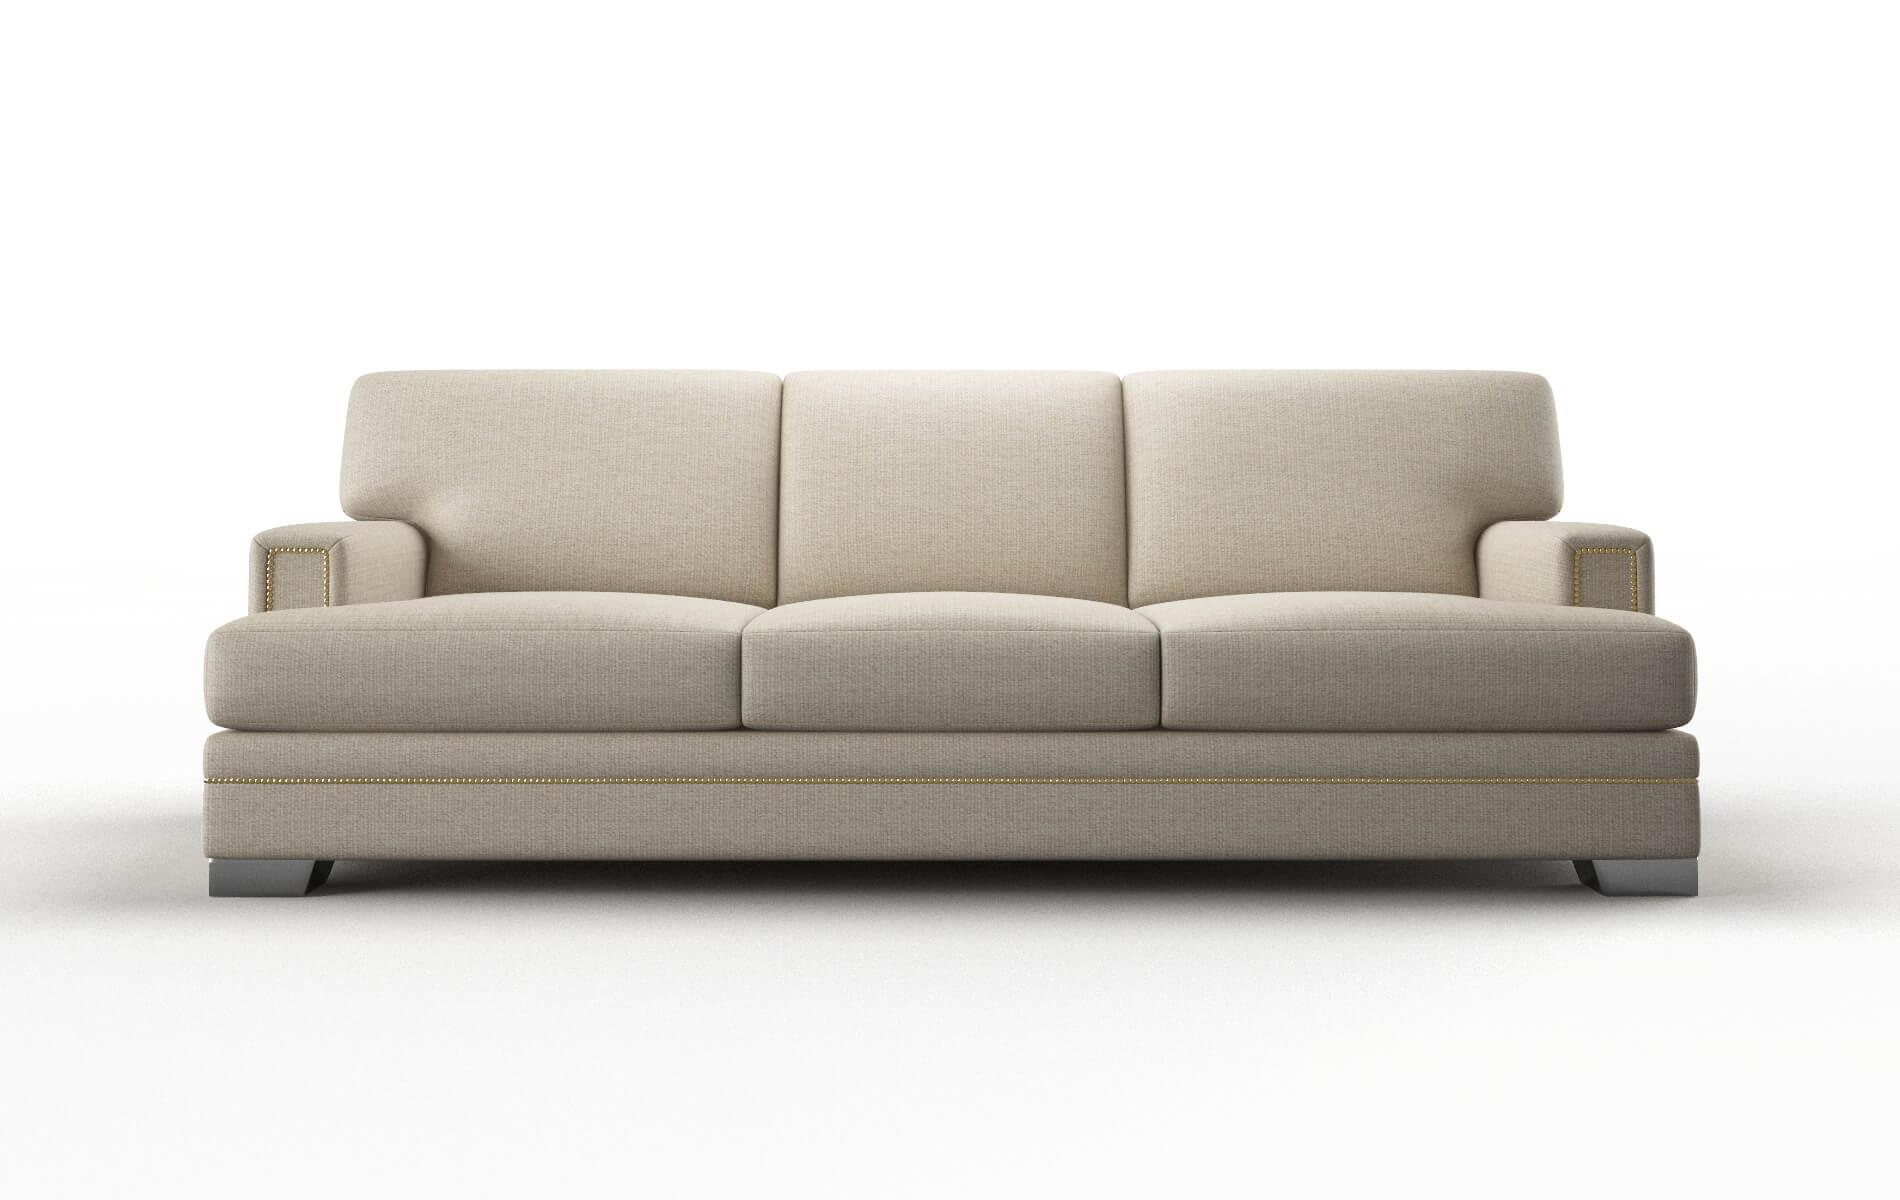 Barcelona Parker Linen Sofa metal legs 1